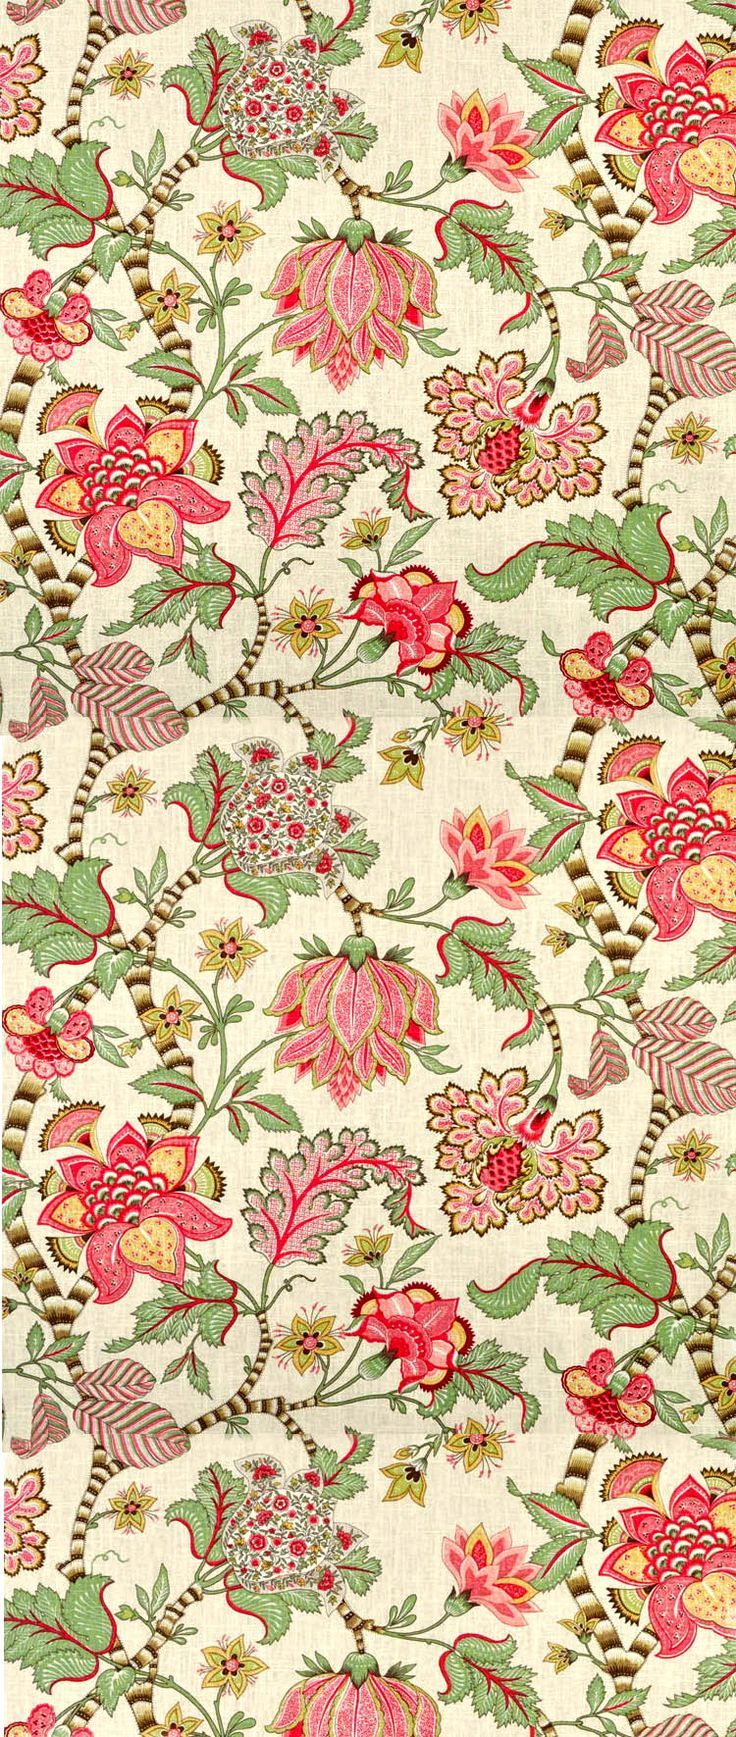 patterns.quenalbertini: Floral design | coquita